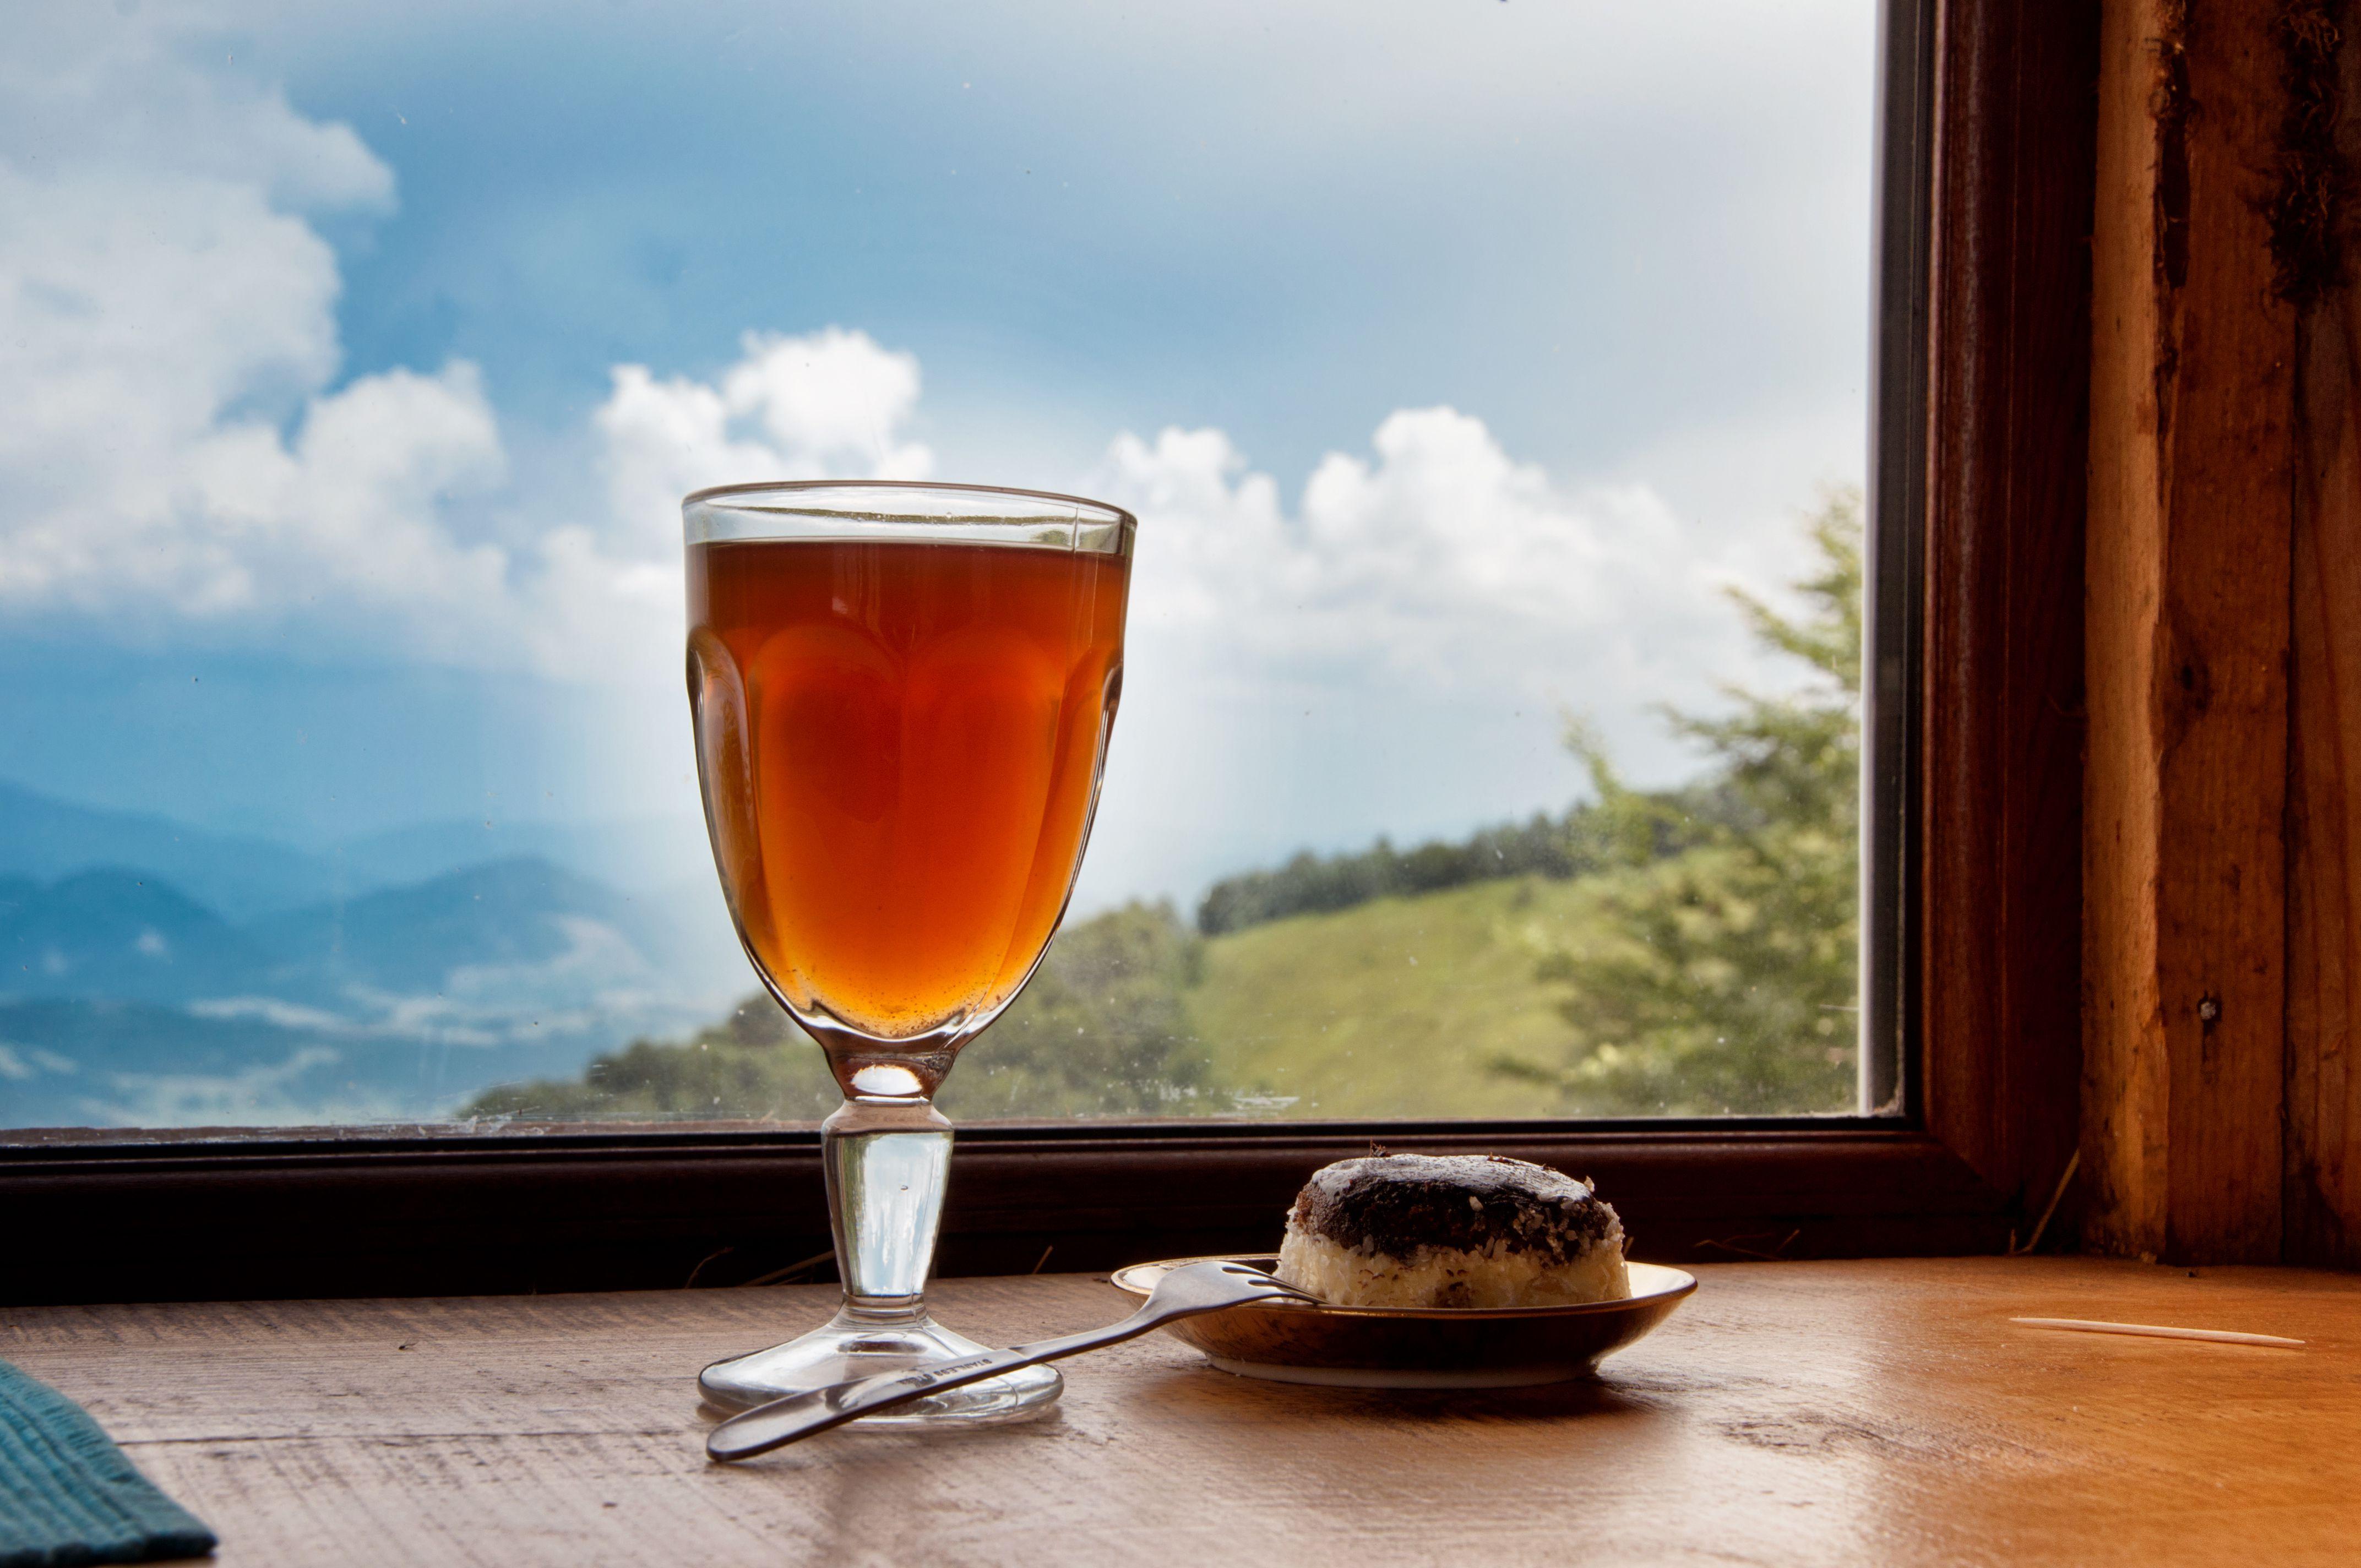 Hot Sbiten drink with cake in Carpatians kolyba